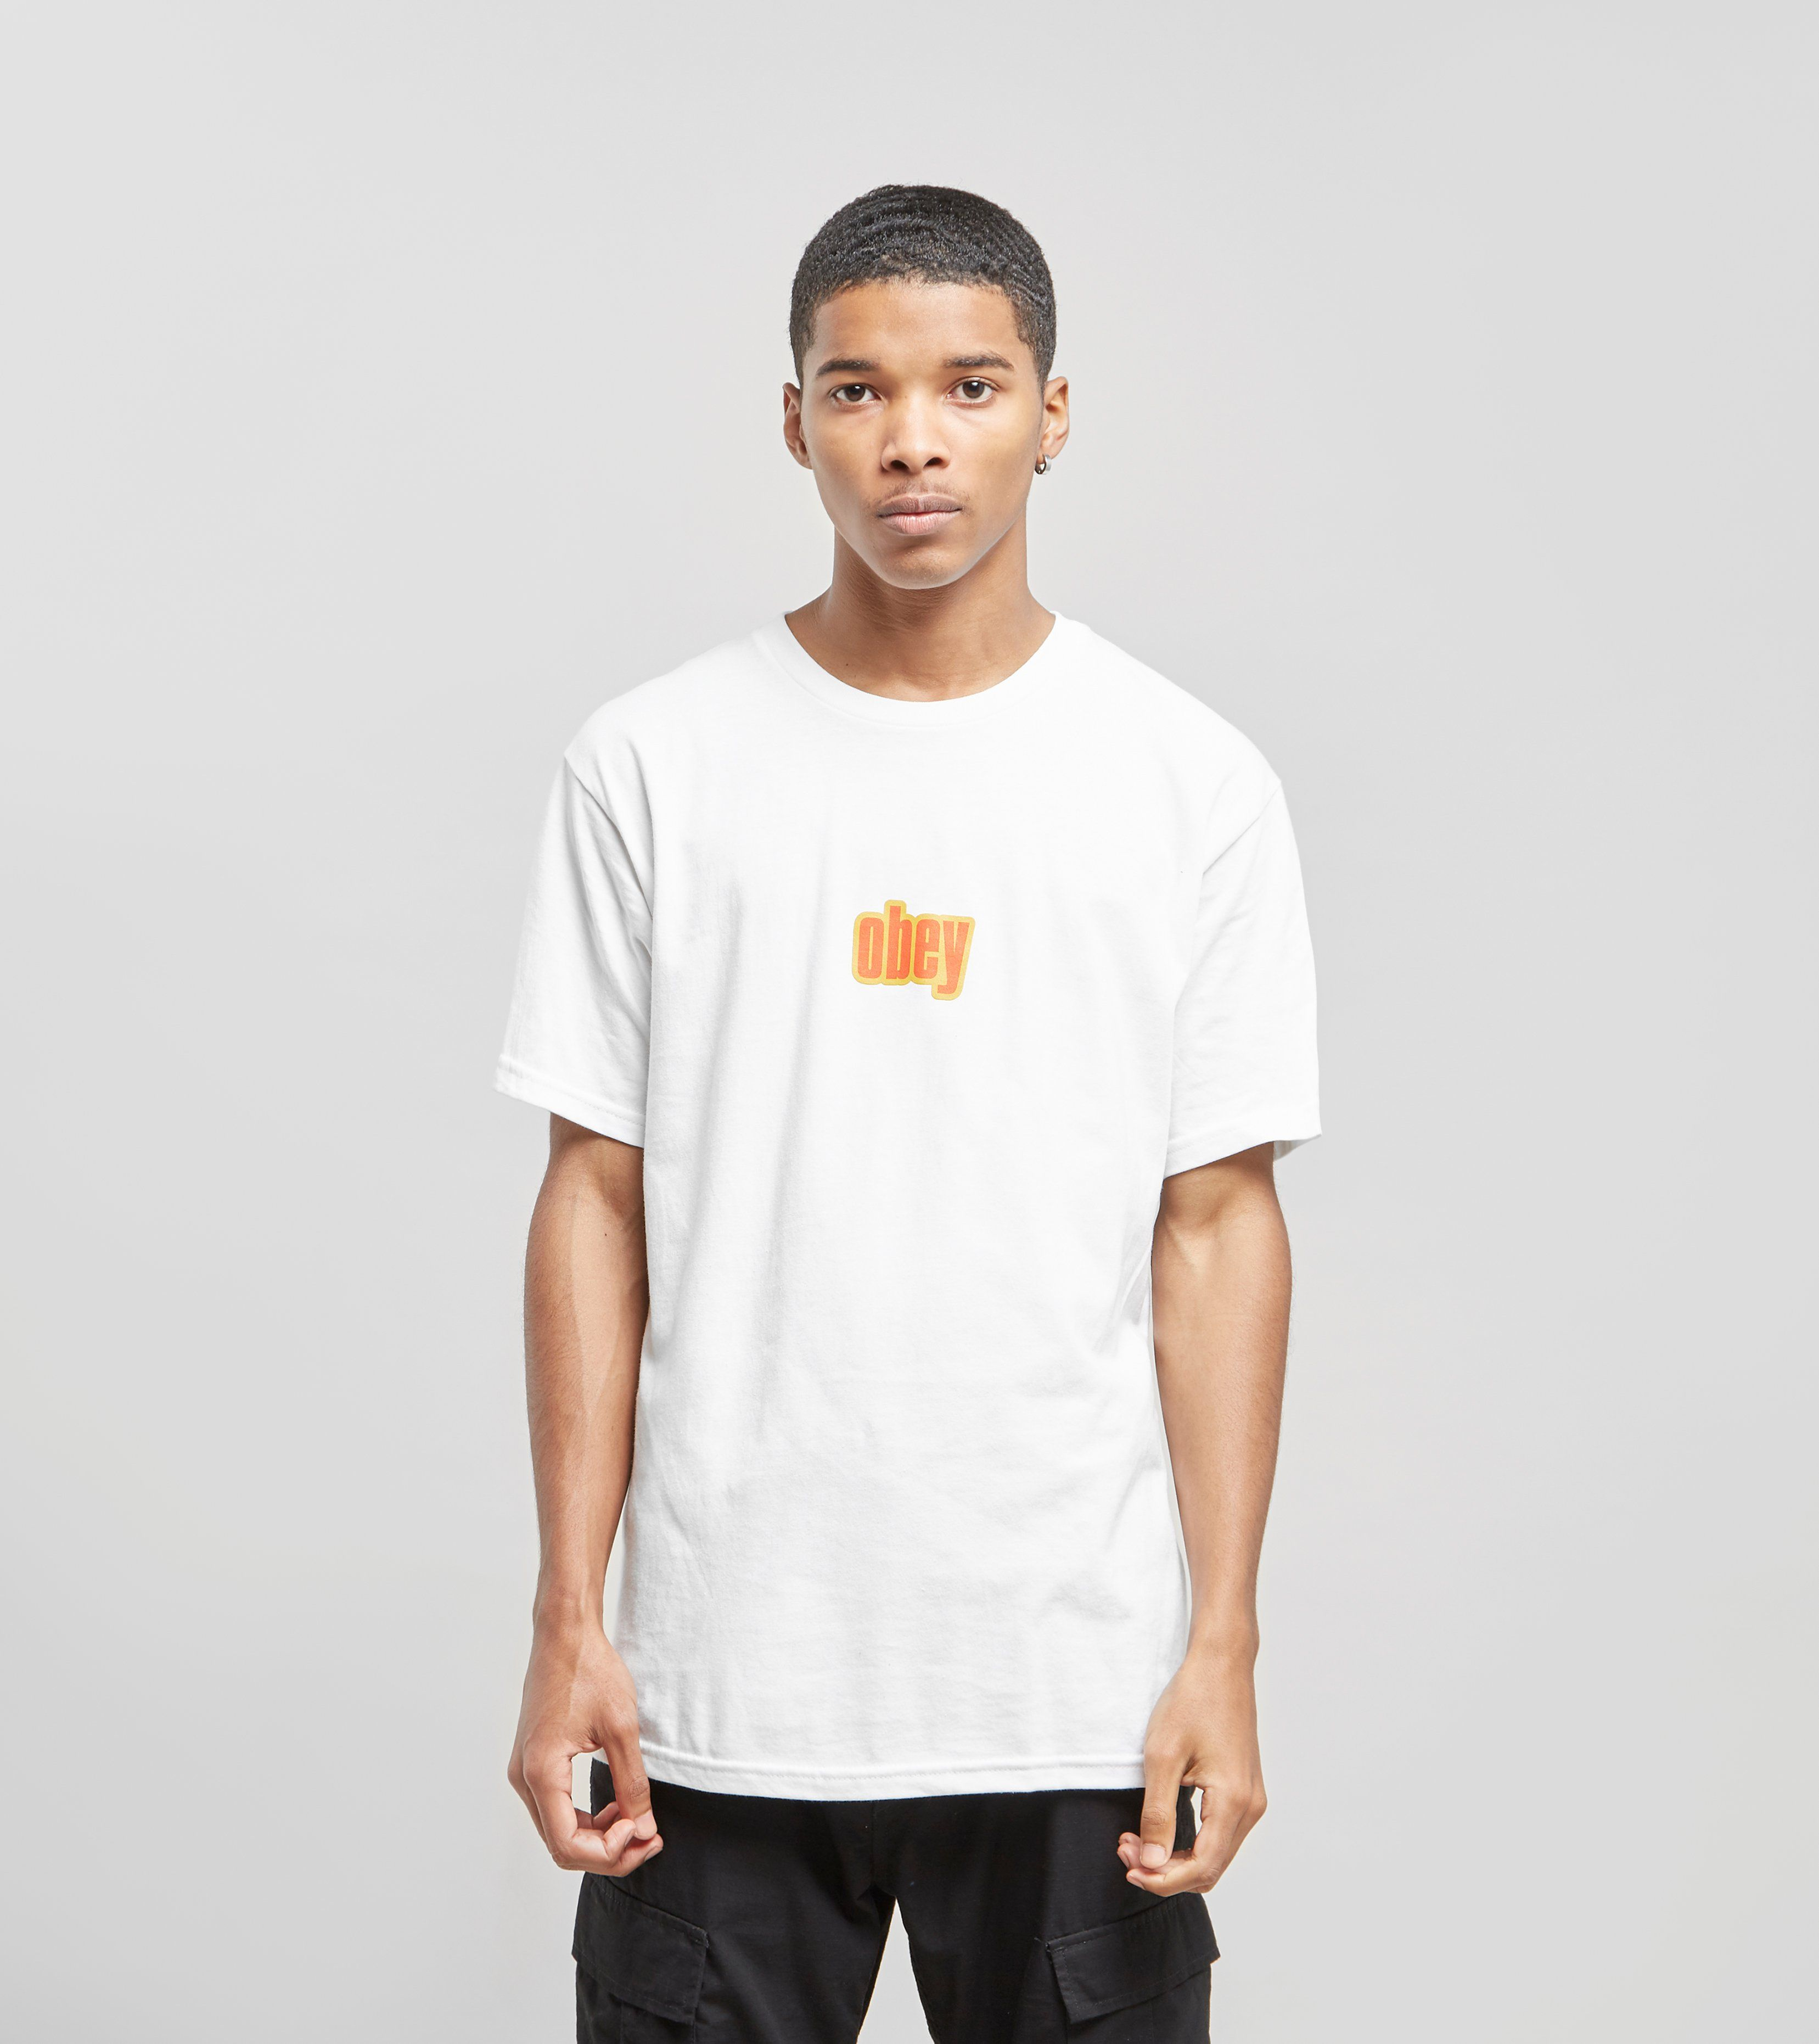 Obey T-Shirt 1990